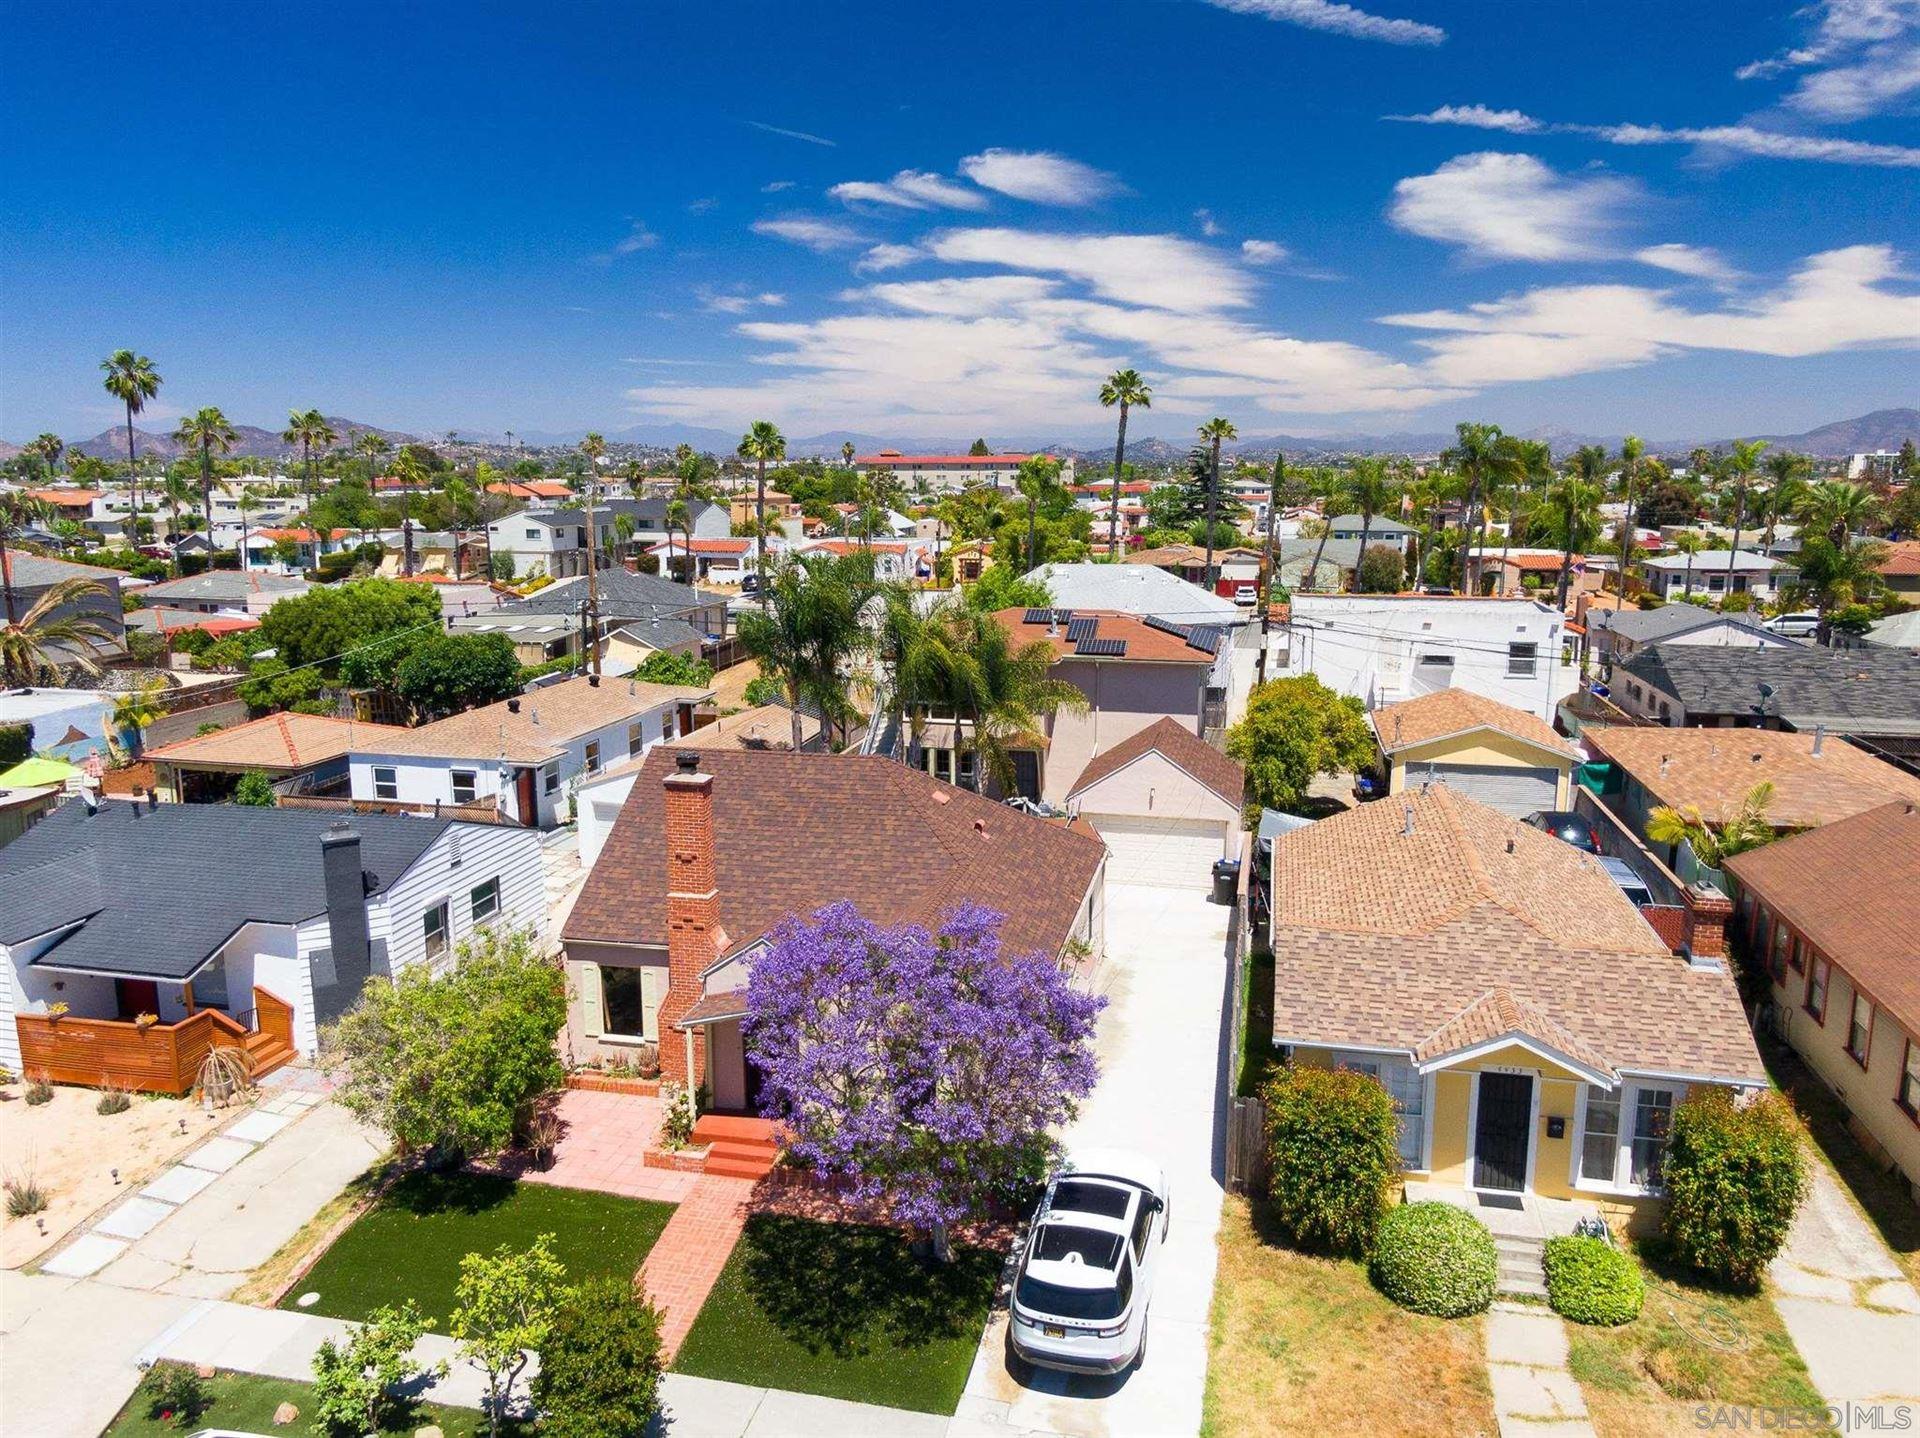 Photo of 4435-39 Felton Street, San Diego, CA 92116 (MLS # 210016205)